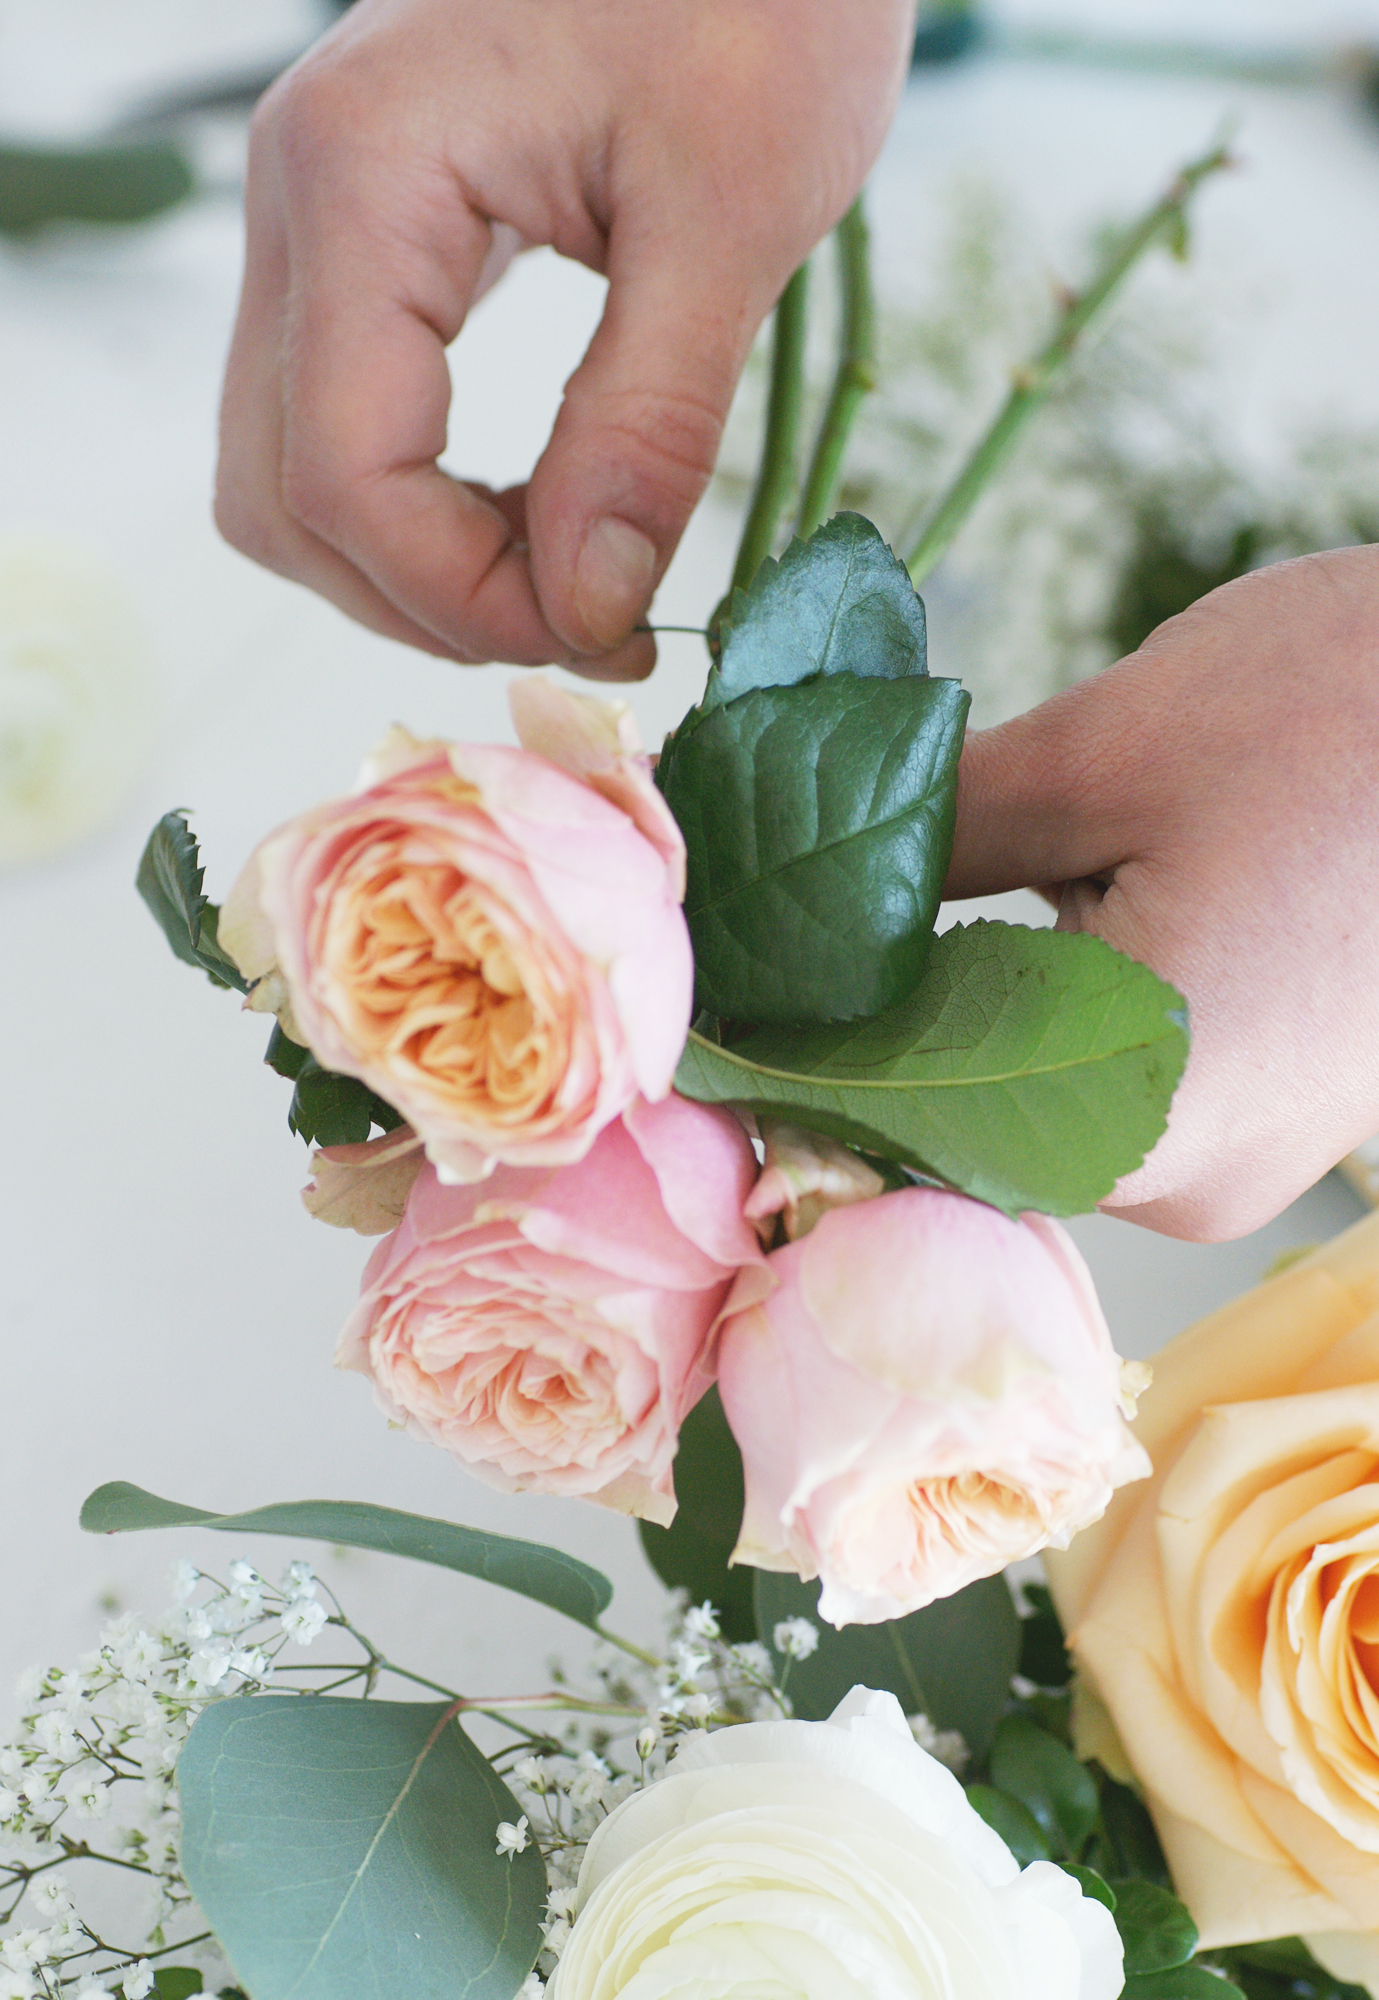 Stuhlgirlanden selber binden - Blumenbouquet binden